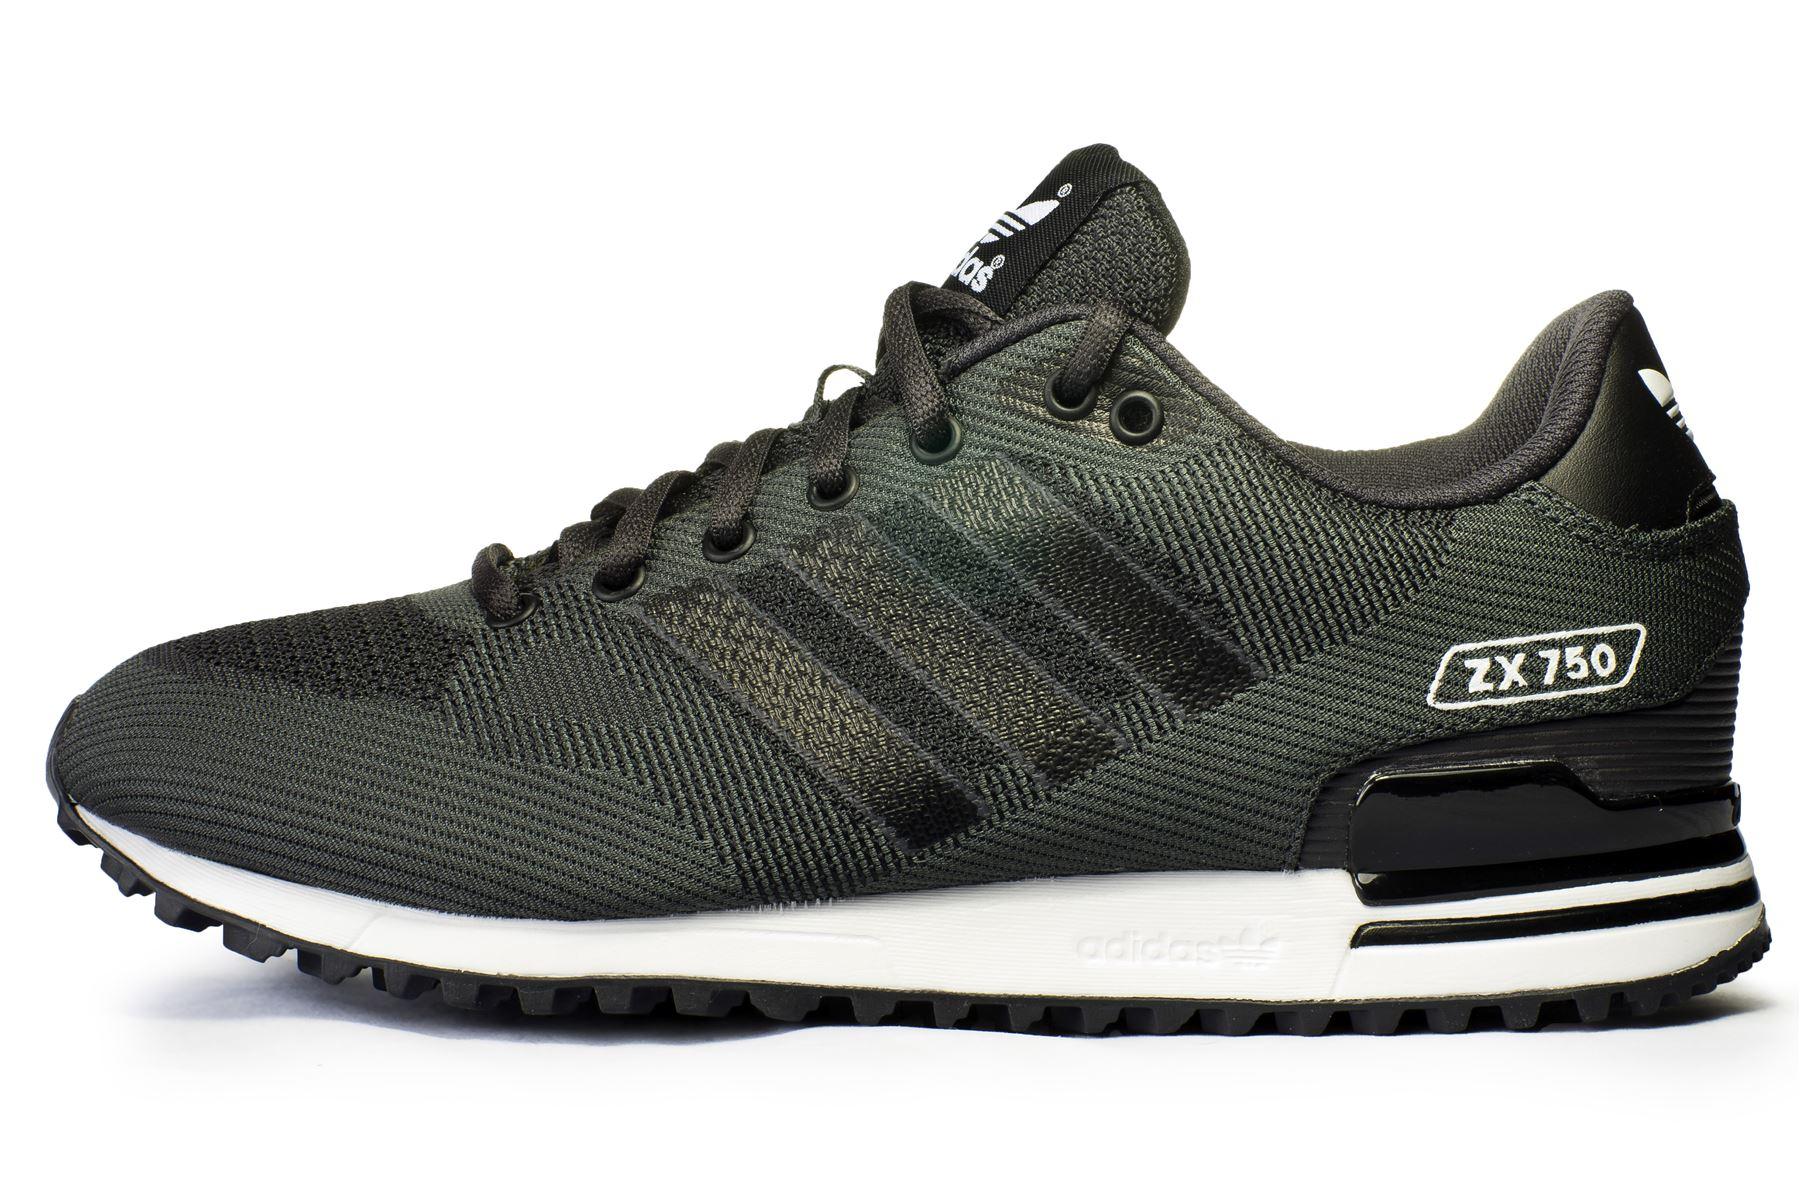 zx 750 Black